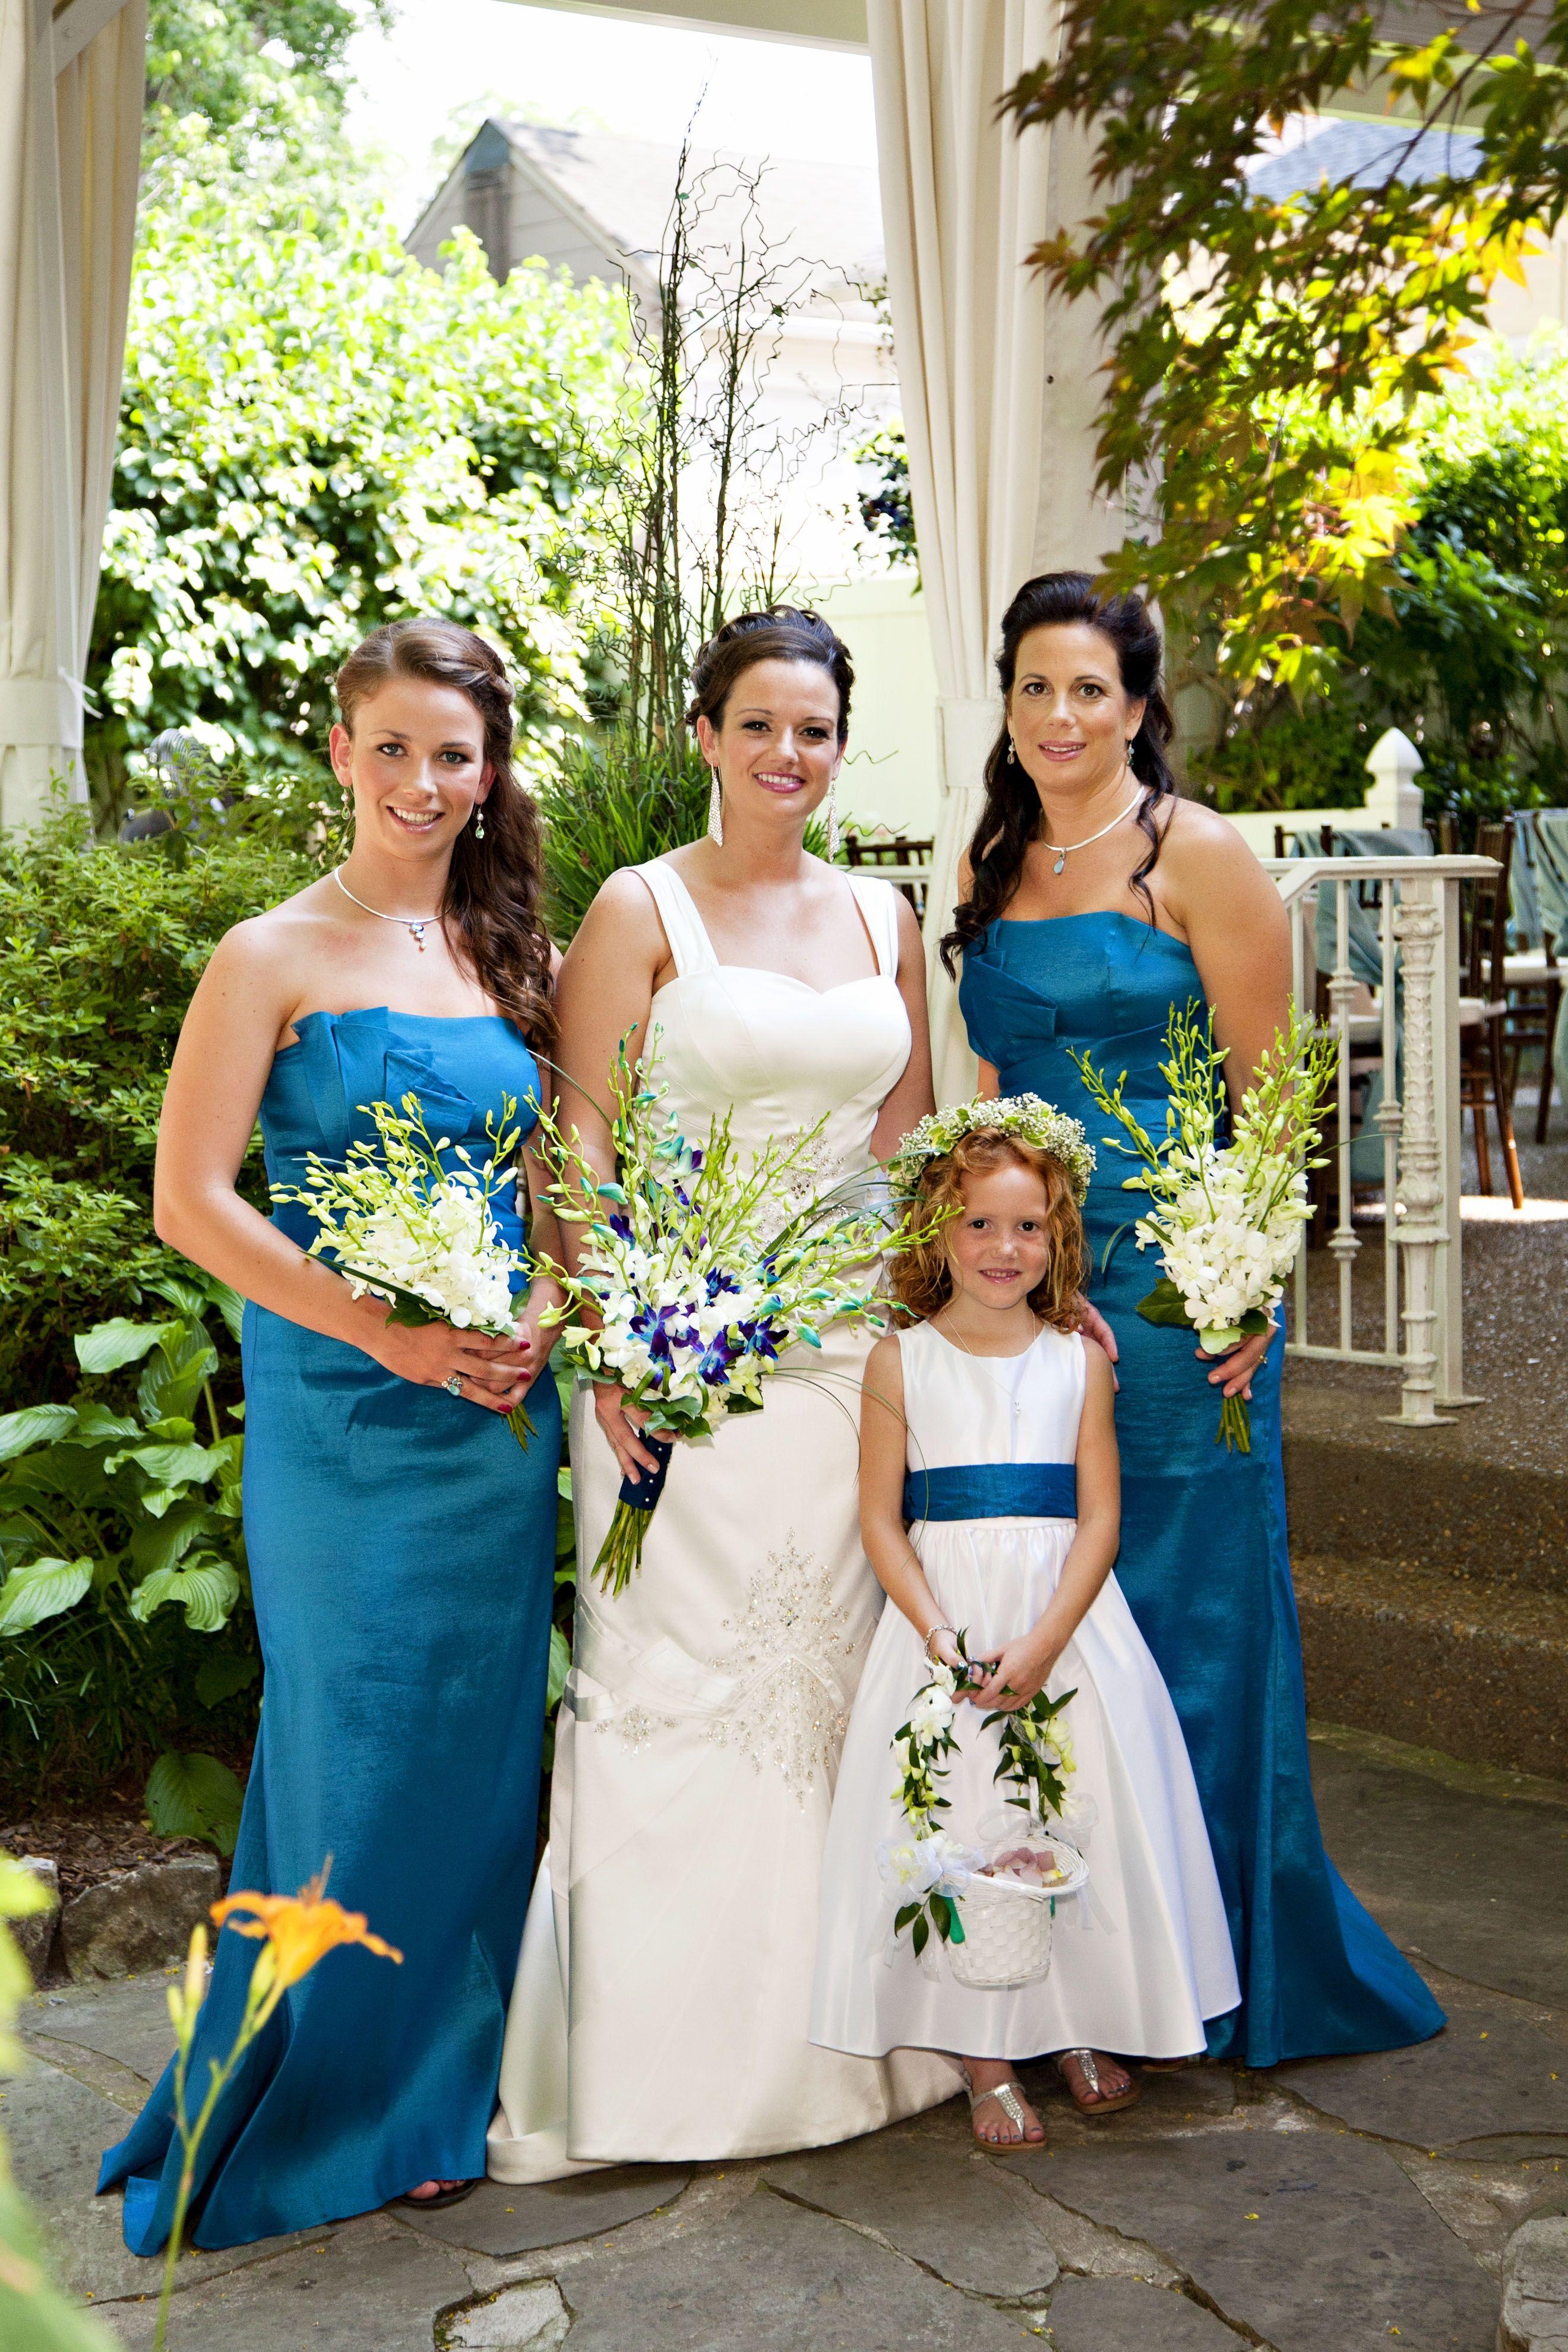 A tropical affair orchid bouquet garden weddings and wedding venues